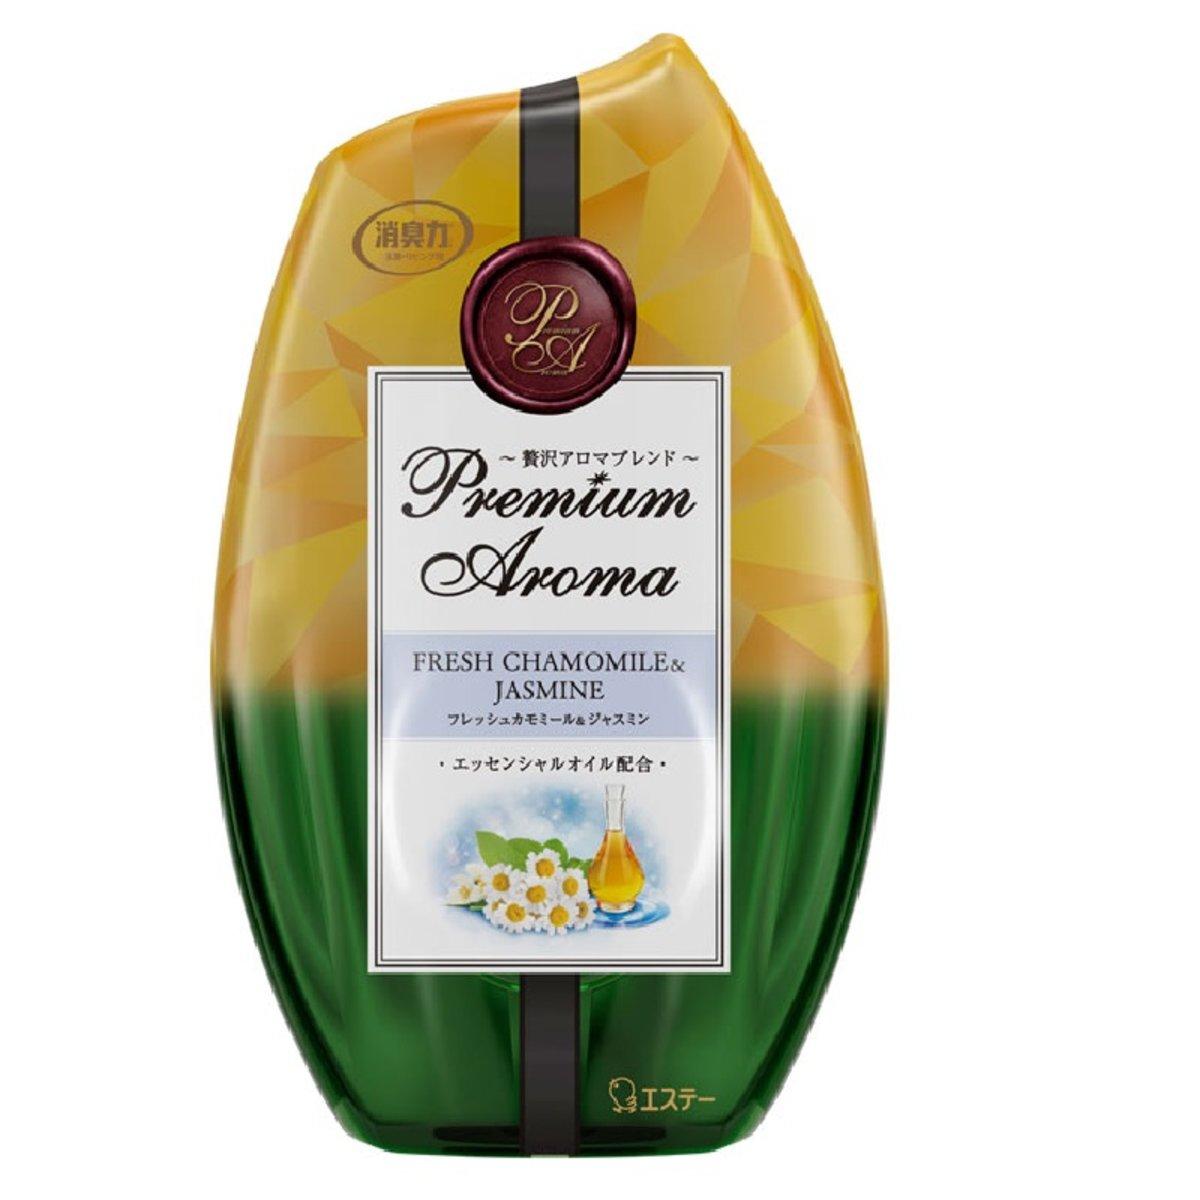 S.T. Corporation Indoor Deodorant (Yellow Green) #Fresh Chamomile & Jasmine 400ml